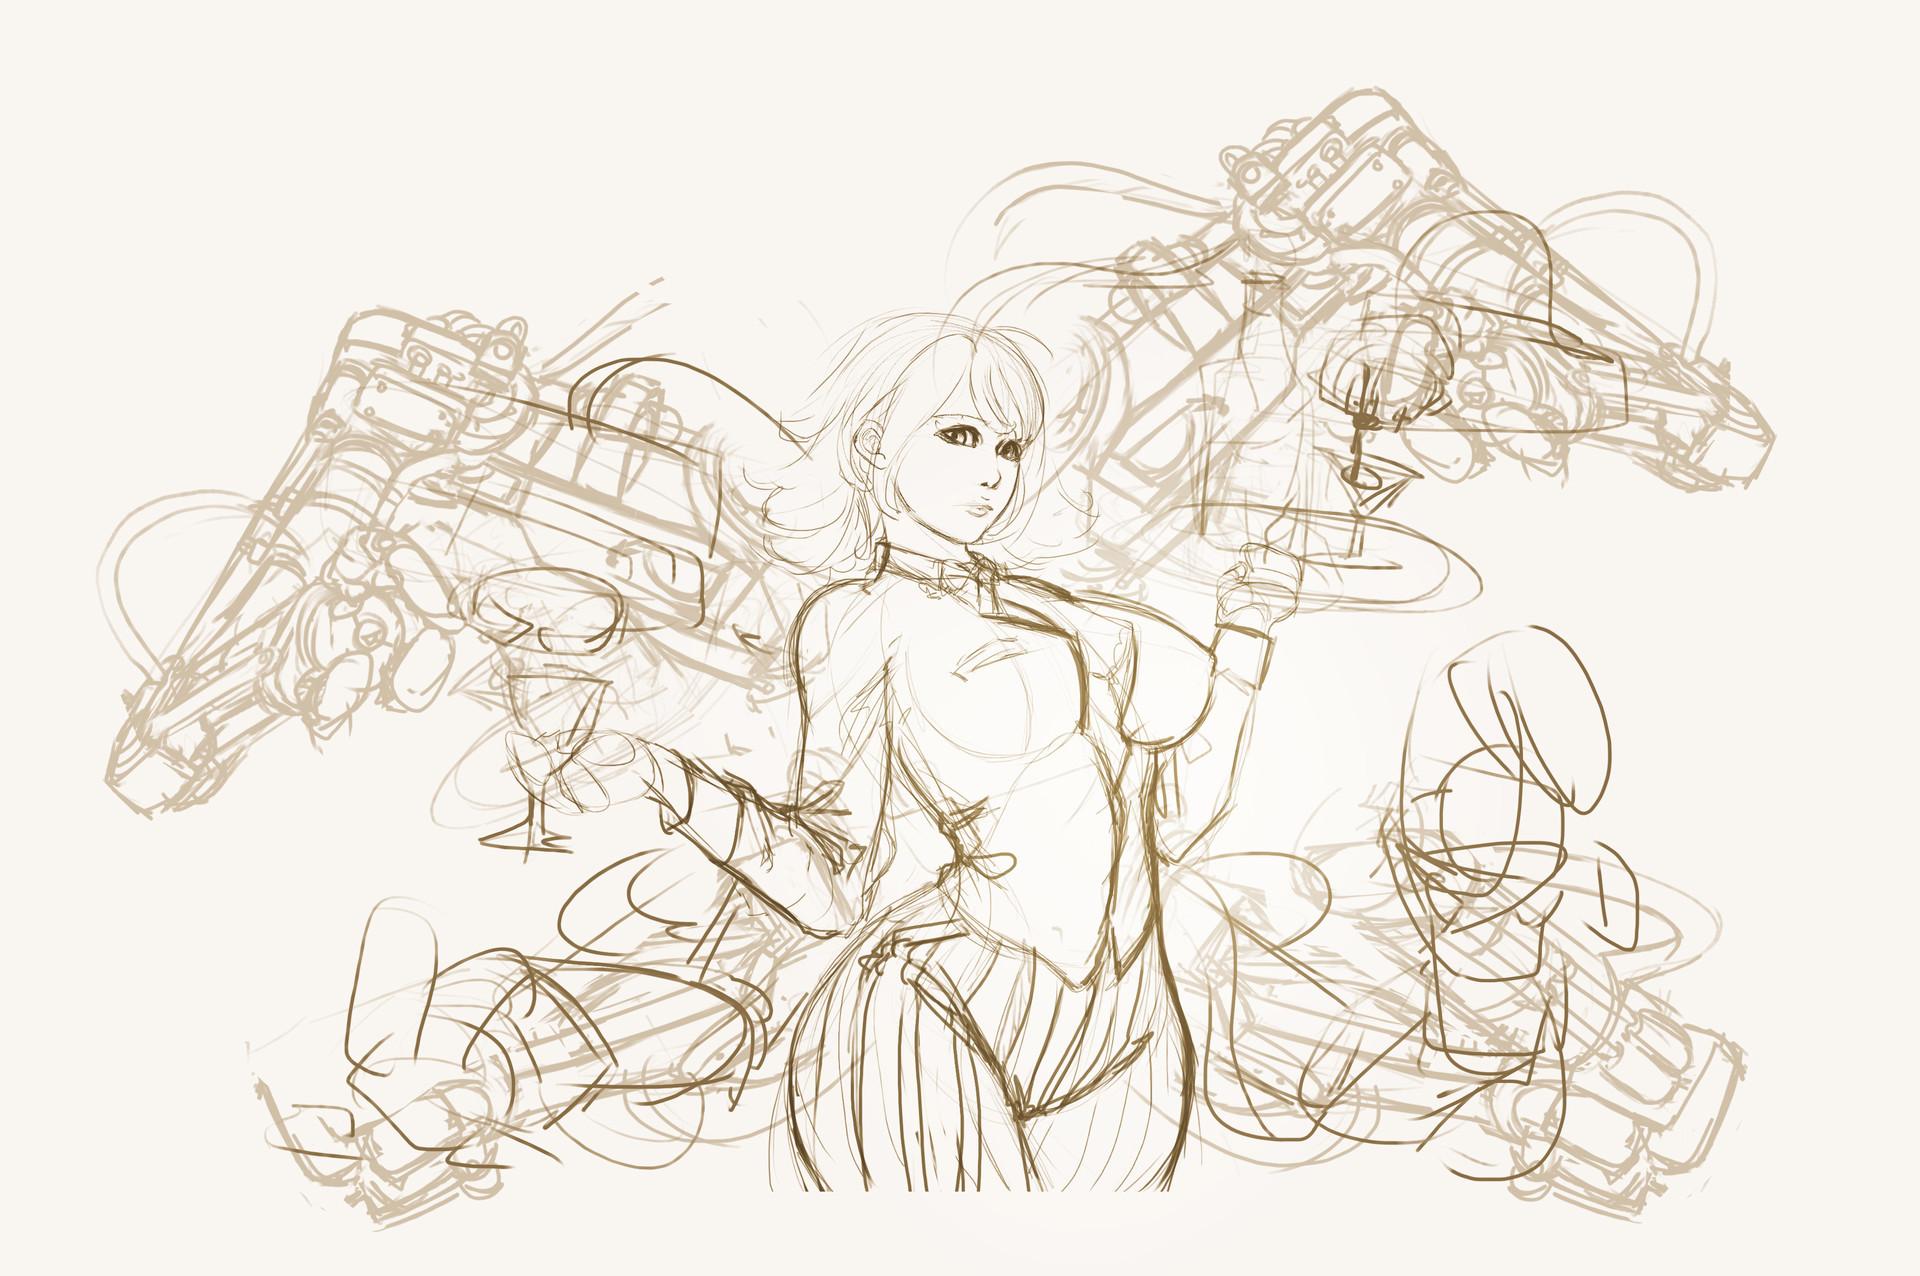 Dzung phung dinh bartania sketch